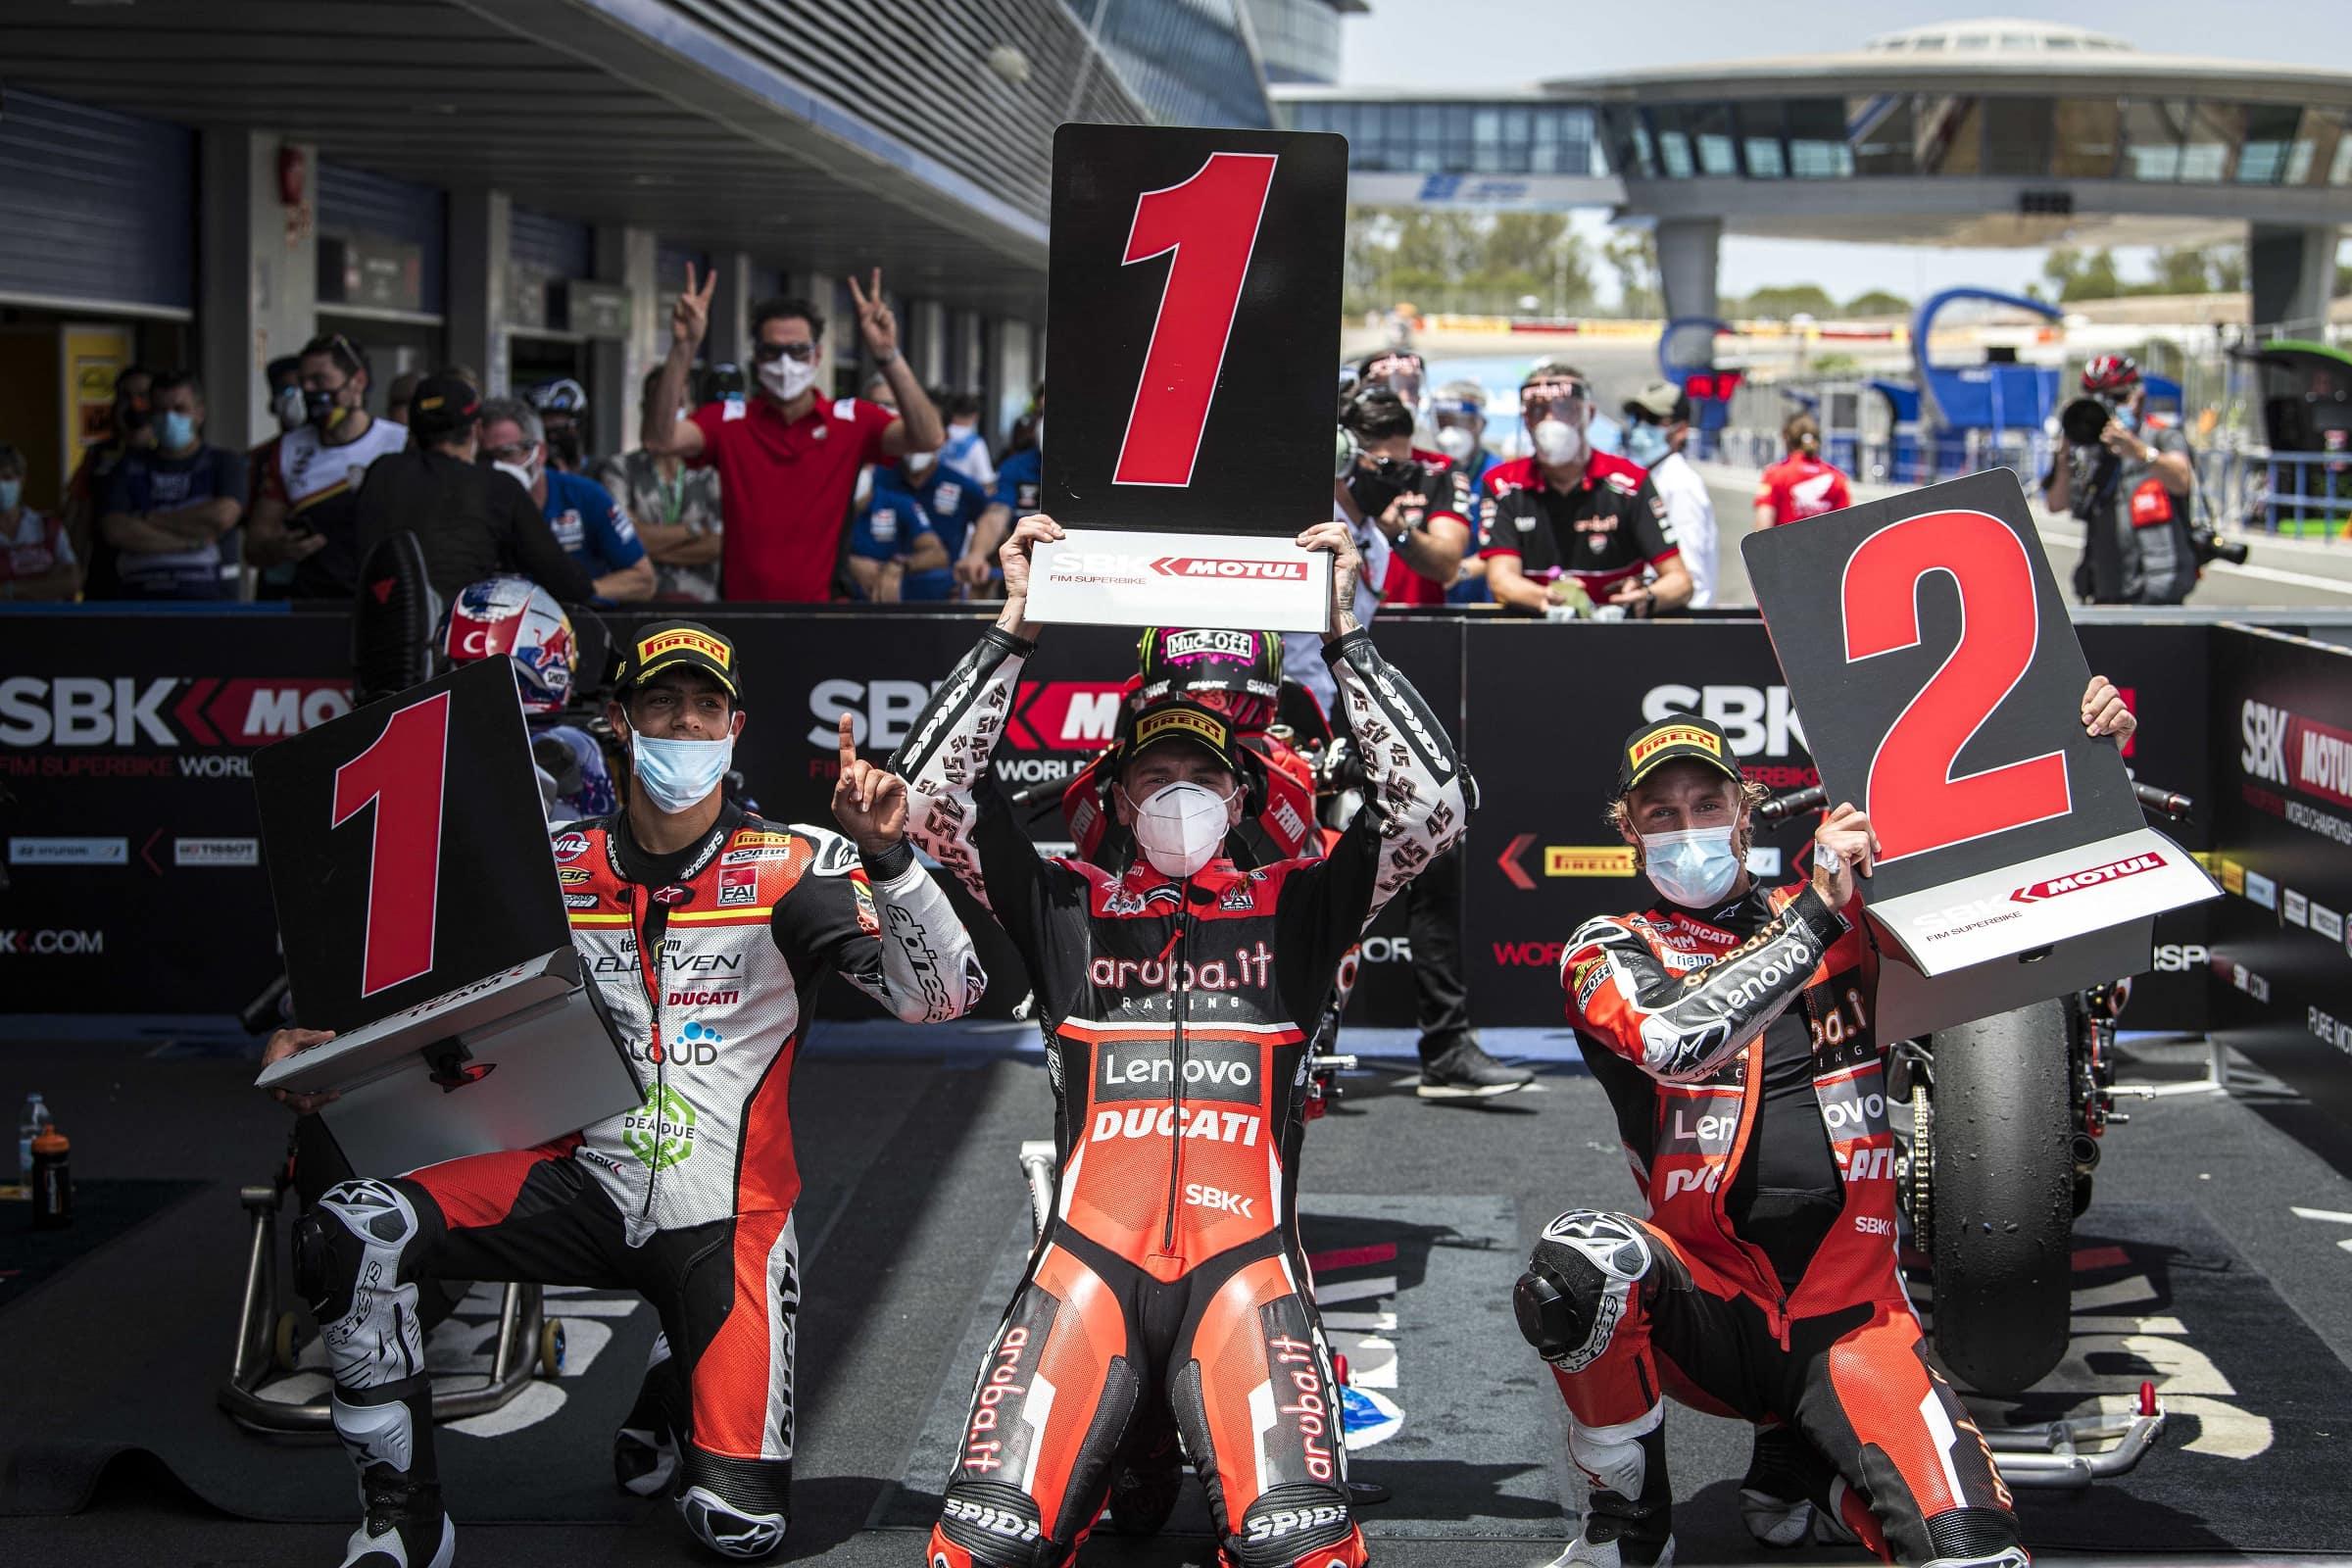 Aruba.it Racing Ducati - Spanish Round 2020